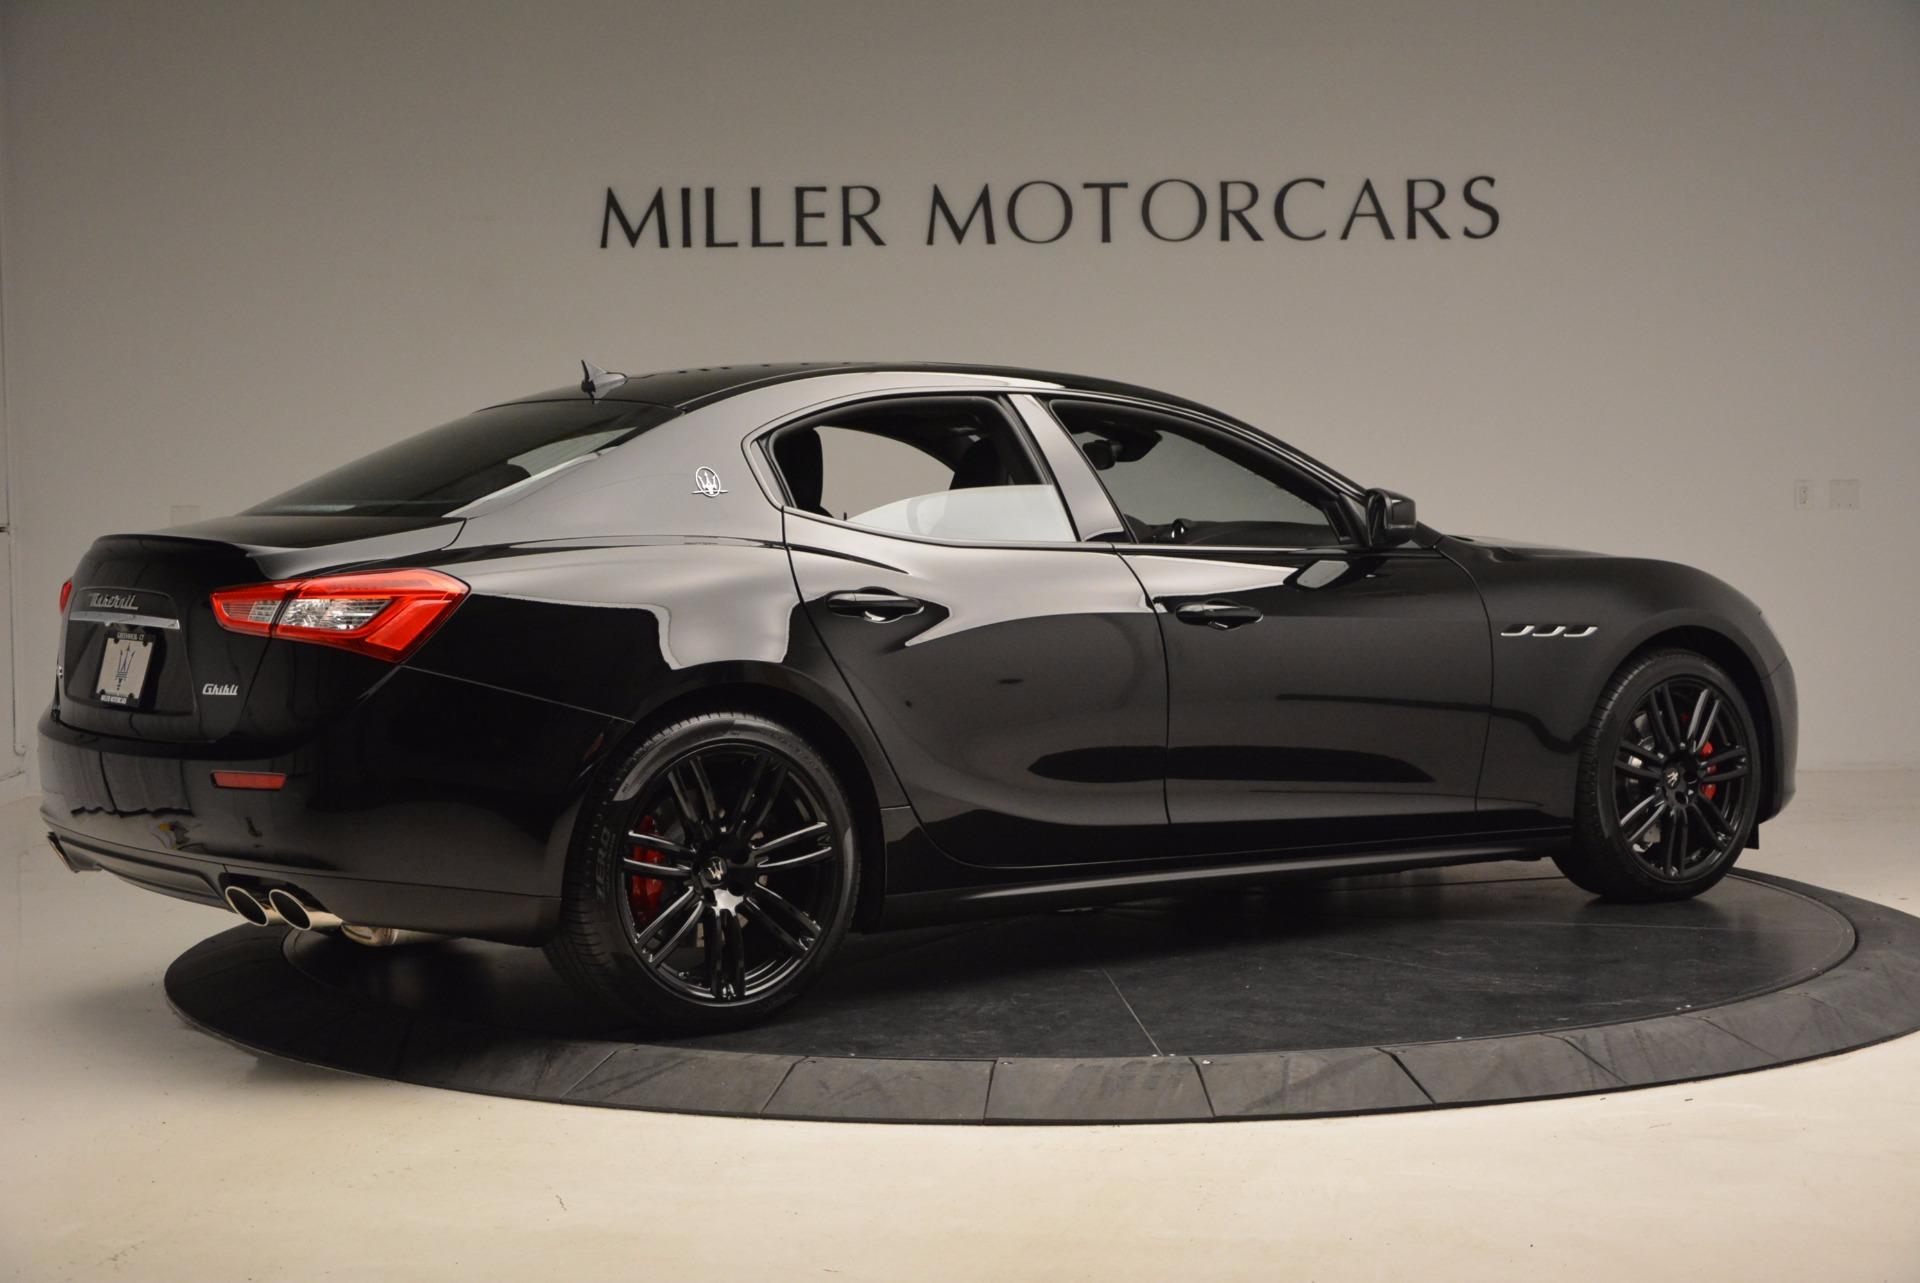 New 2017 Maserati Ghibli S Q4 For Sale () | Miller Motorcars Stock #M1902